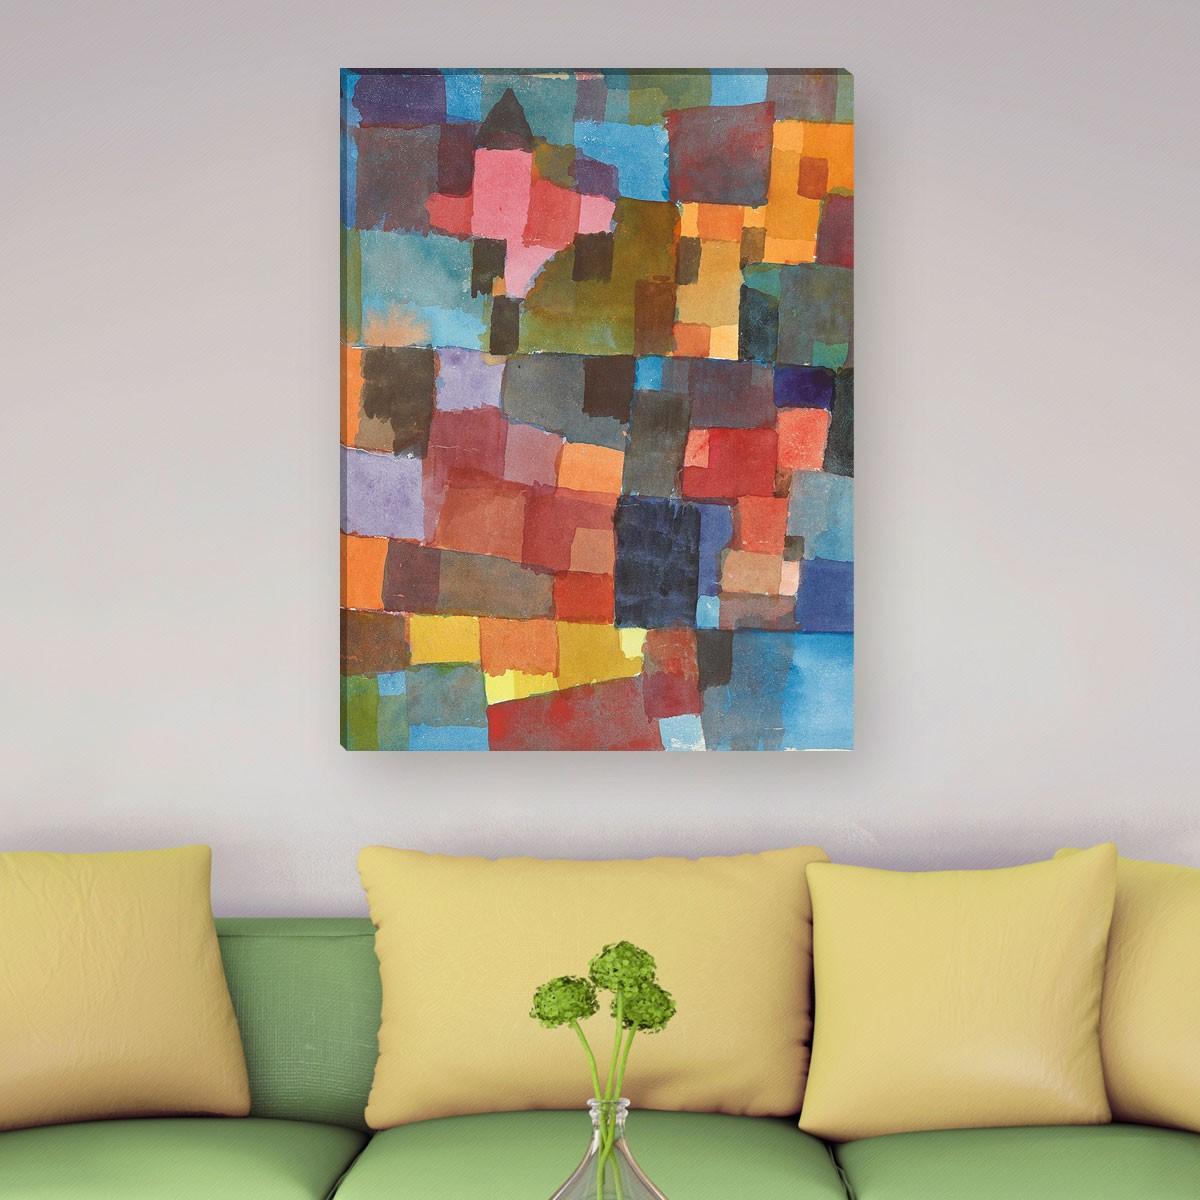 Paul Klee - Raumarchitektur